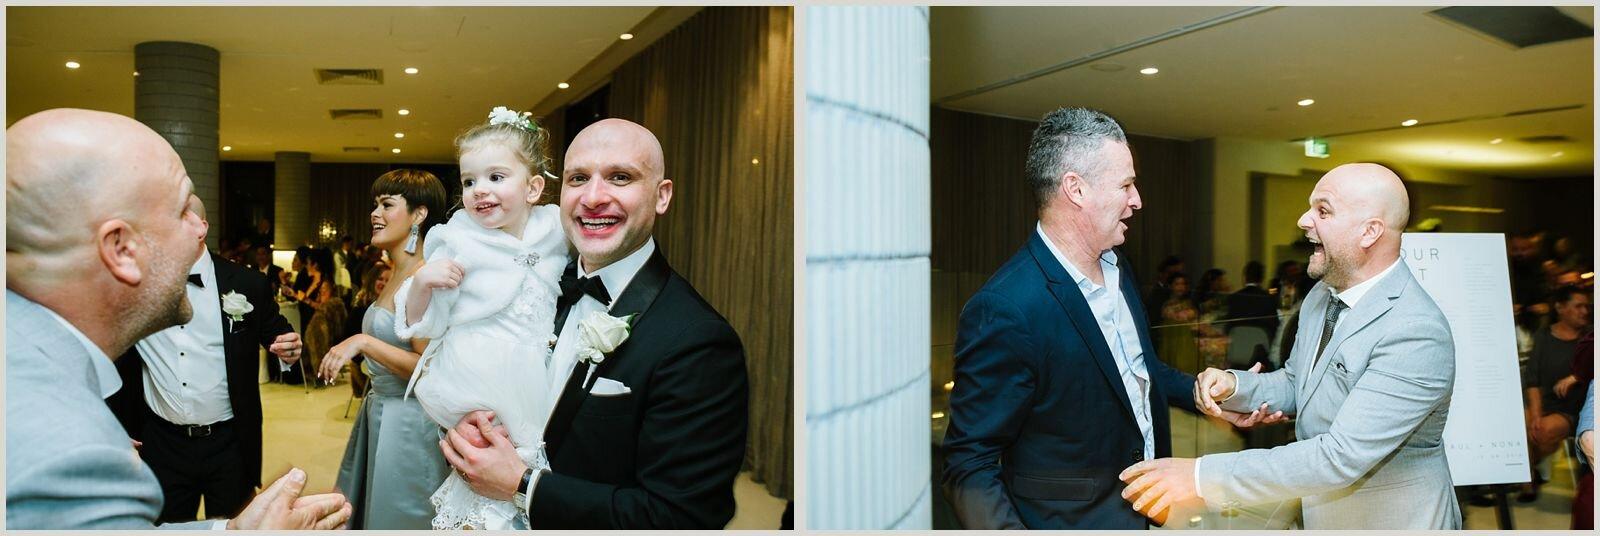 joseph_koprek_wedding_melbourne_the_prince_deck_0079.jpg